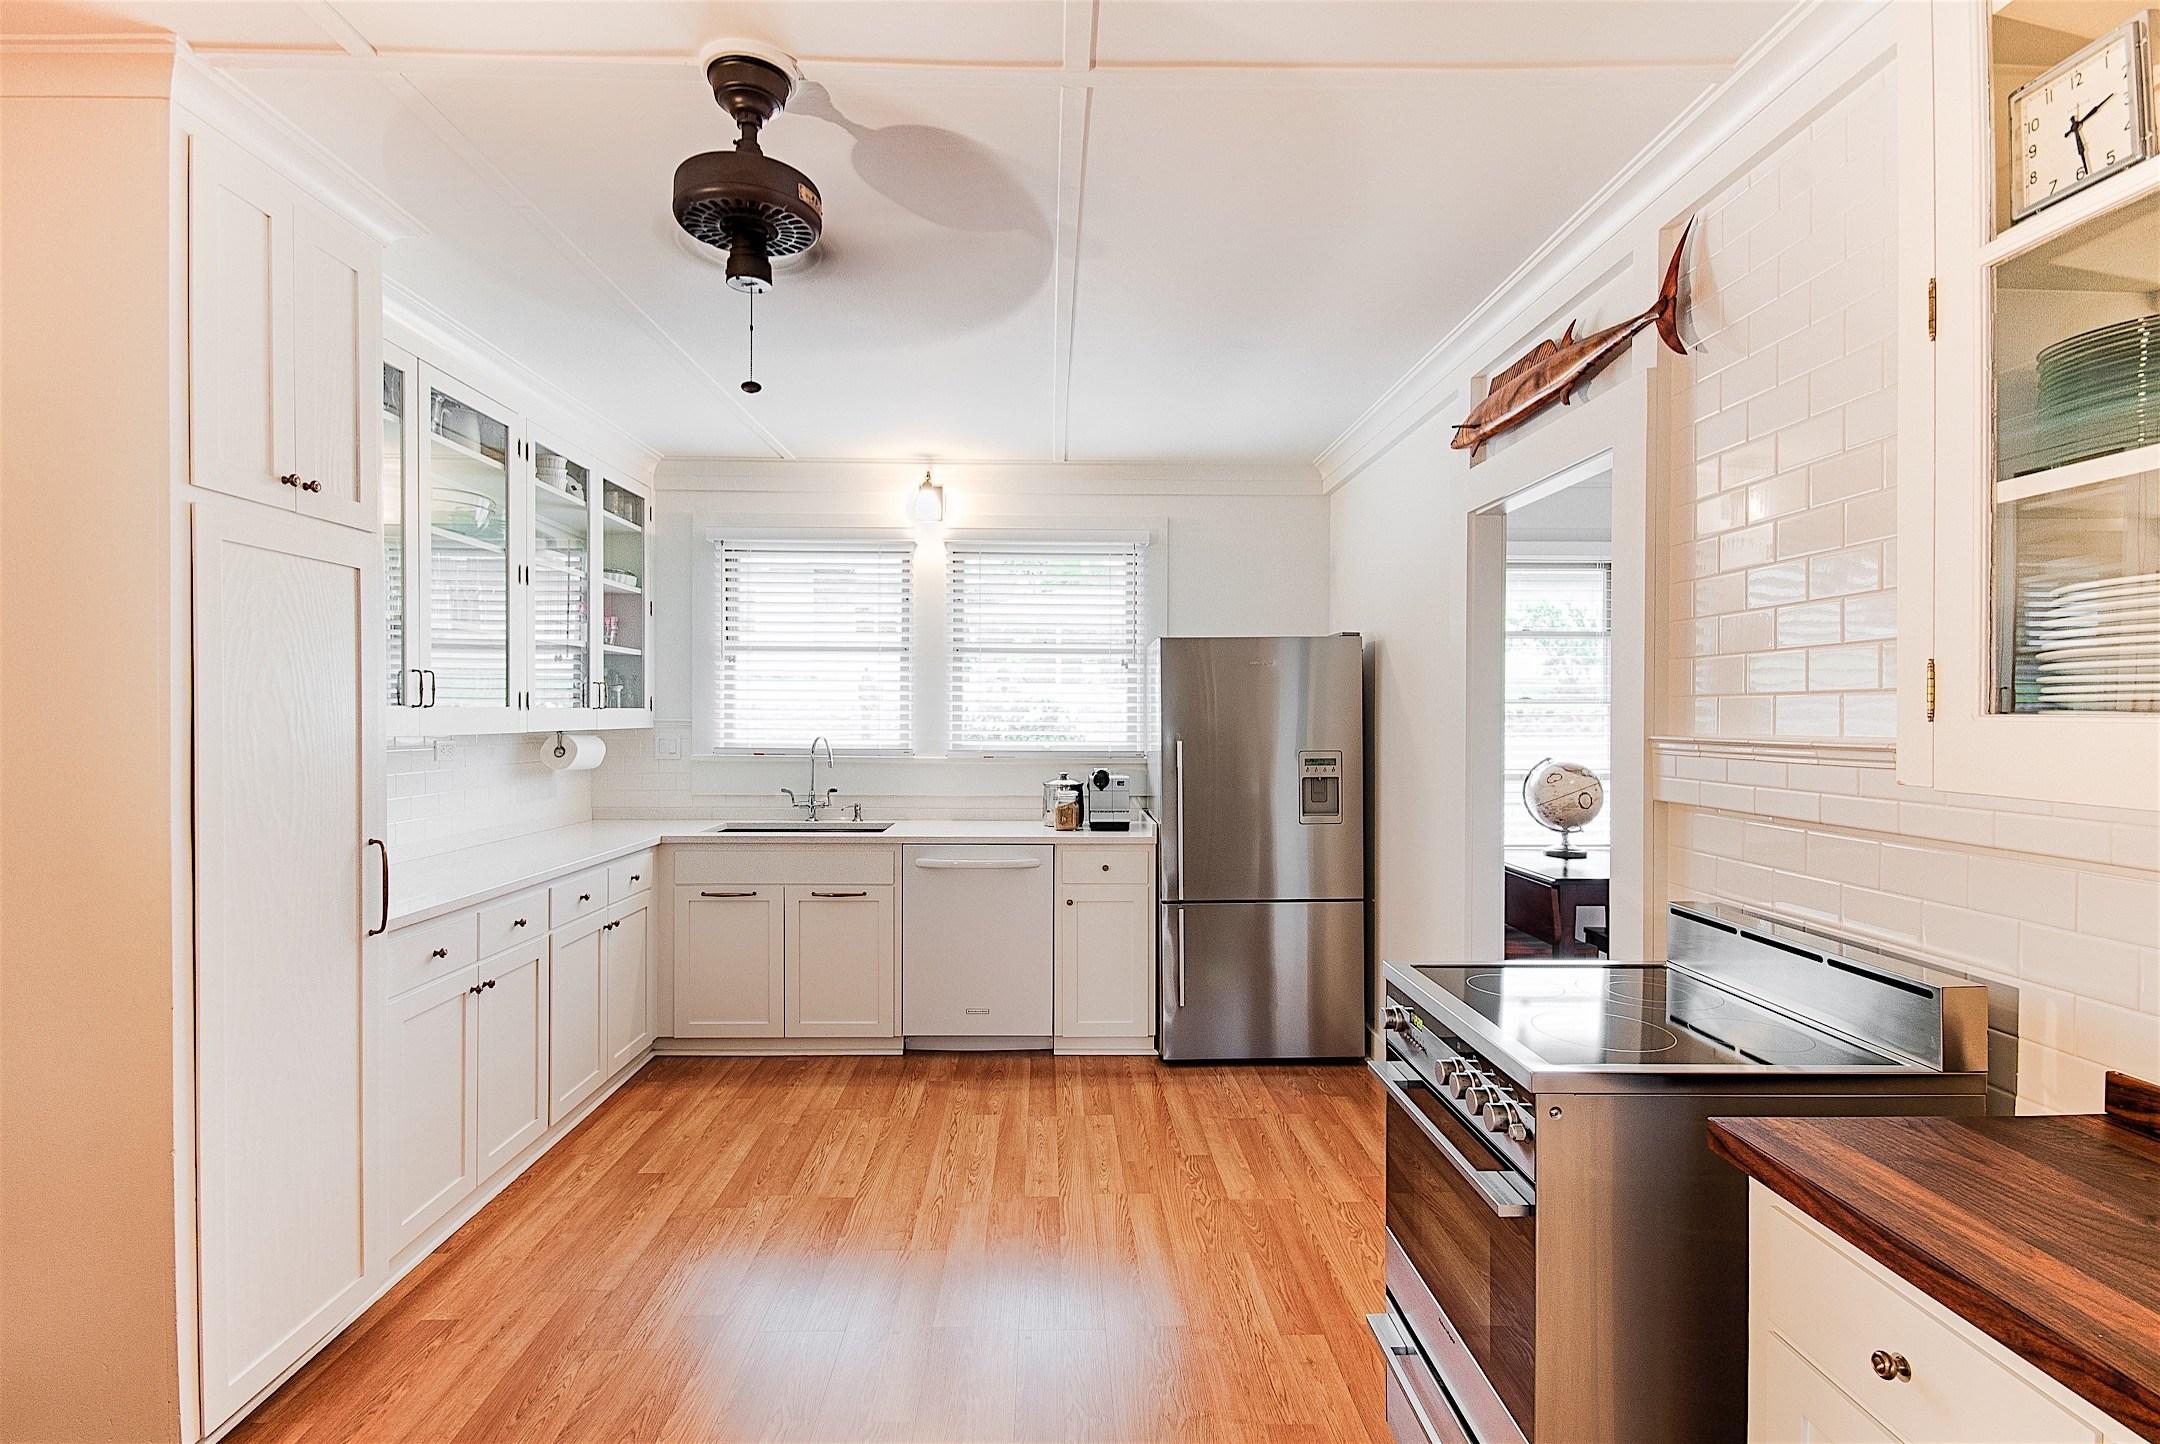 04-wailuku-historic-bungalow-kitchen-after-marshall-design-studio.jpg